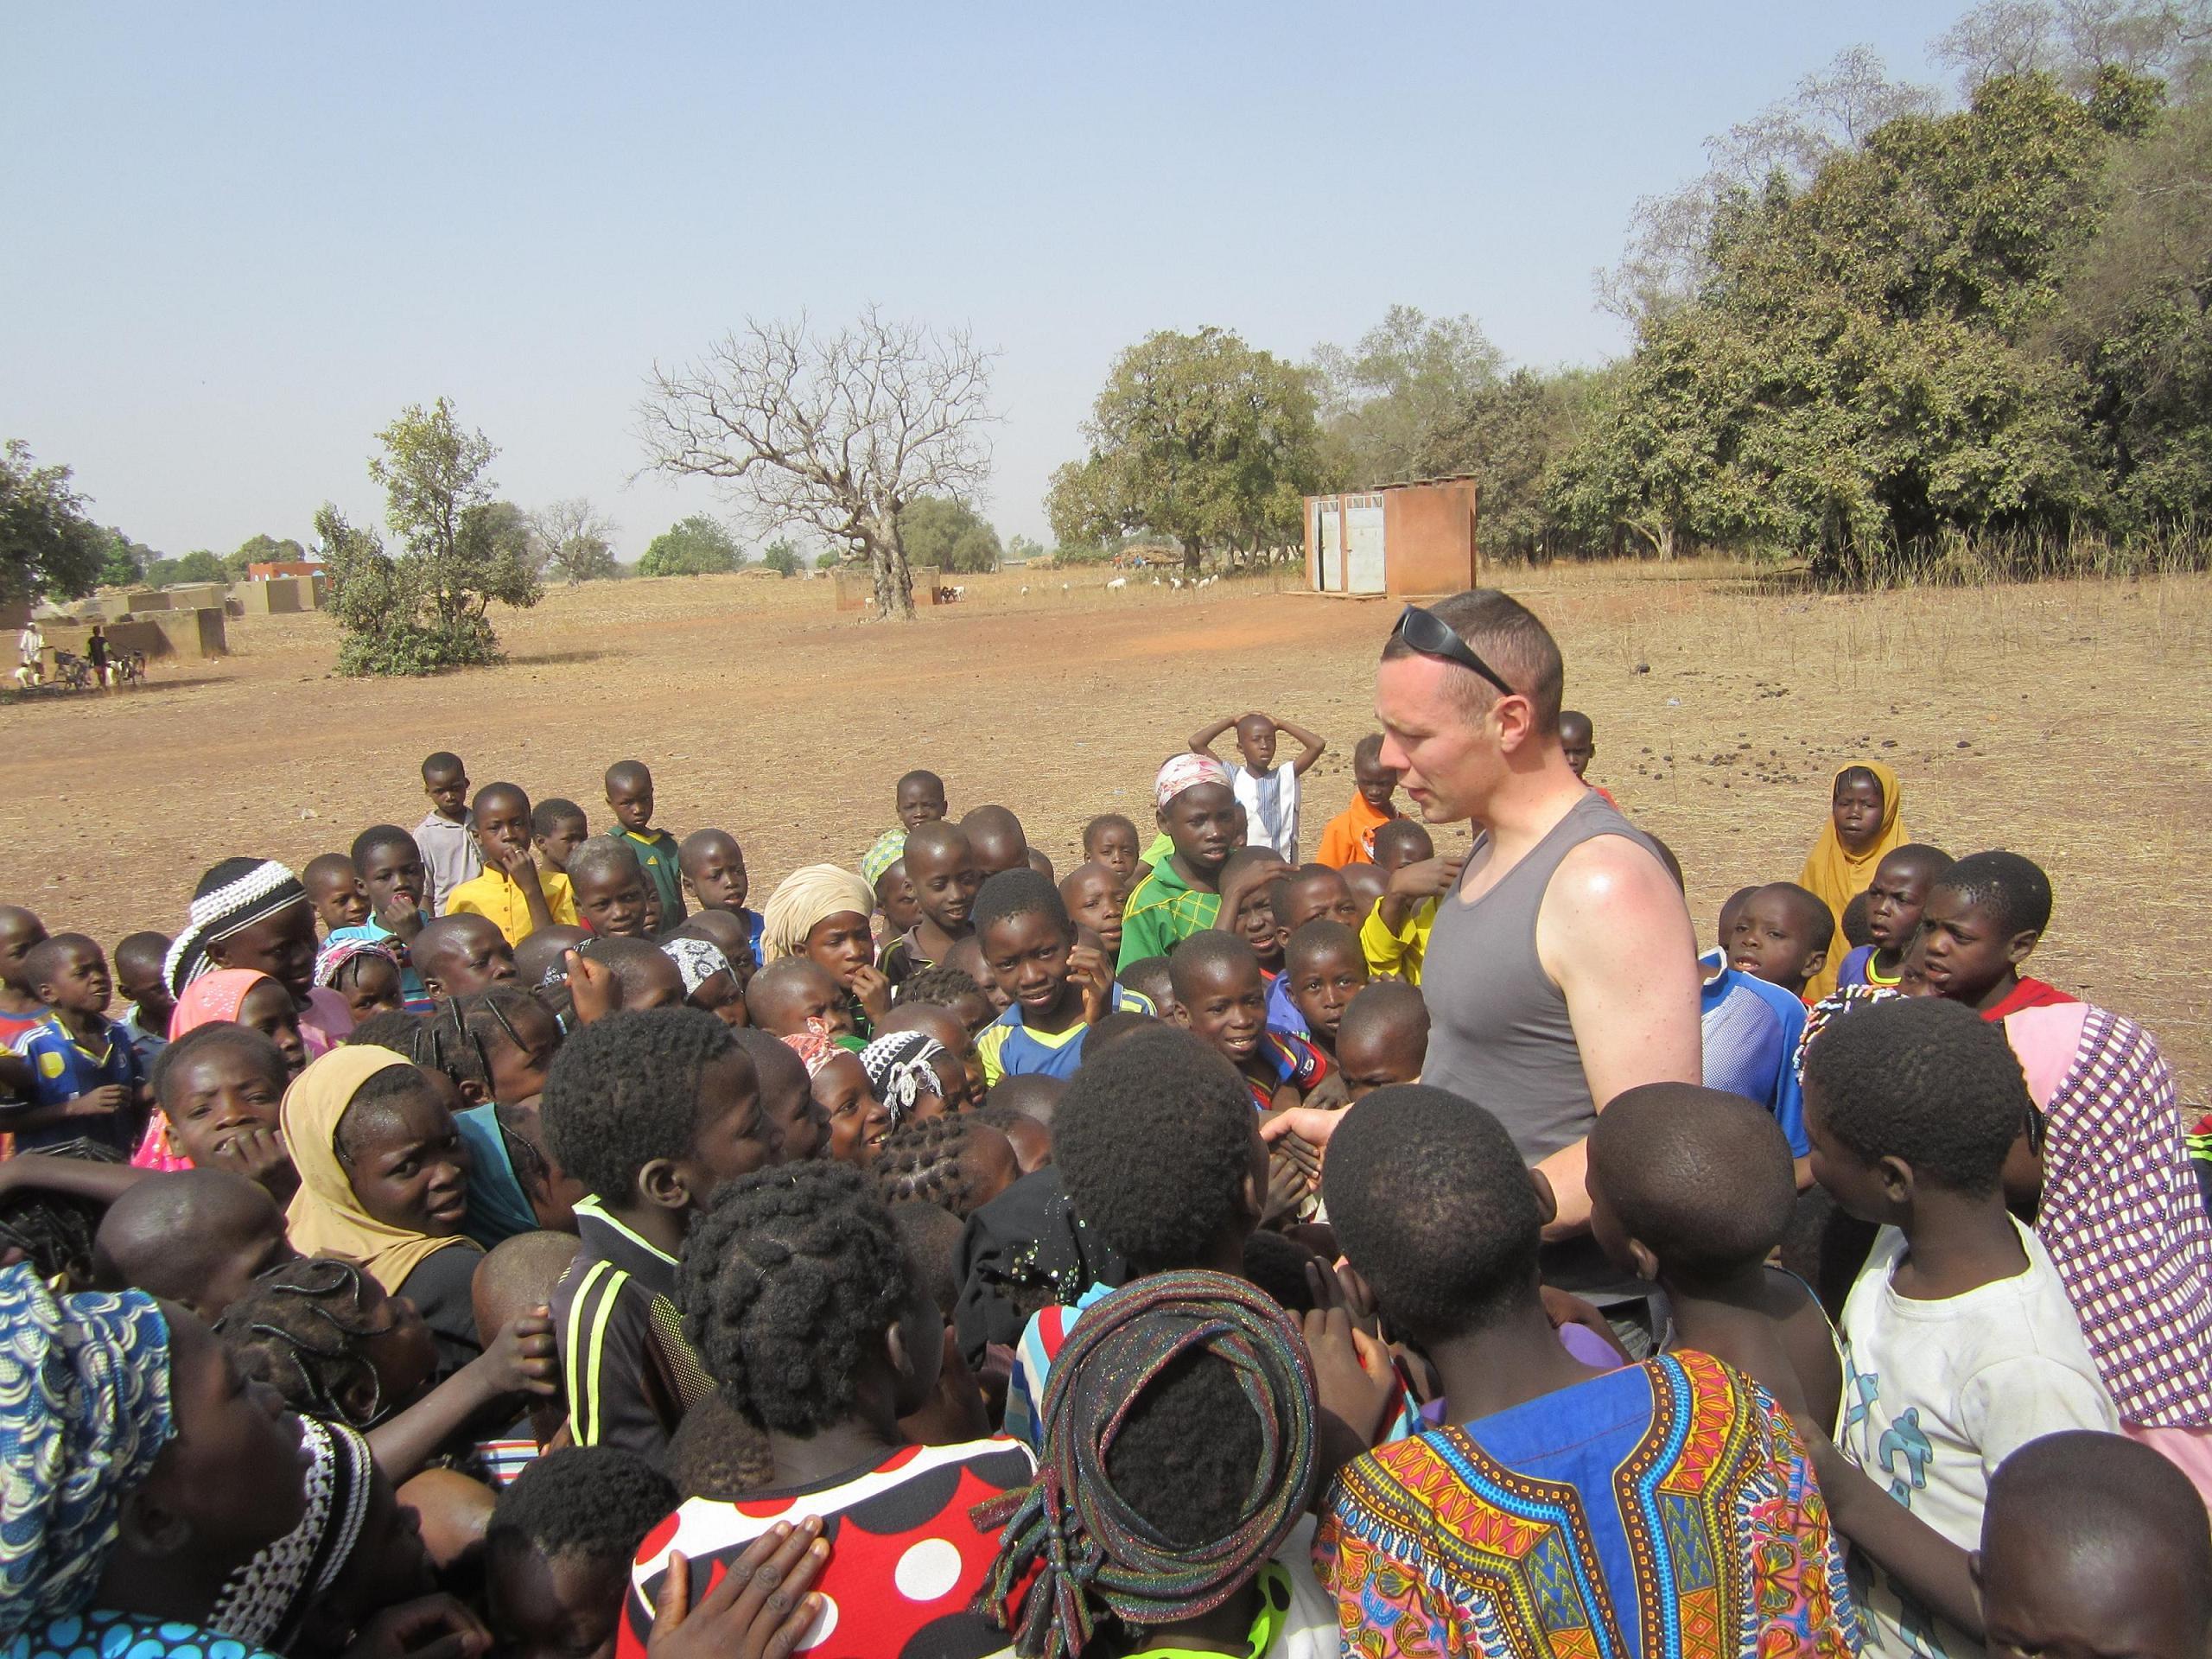 Moment de partage avec les enfants de Basgana